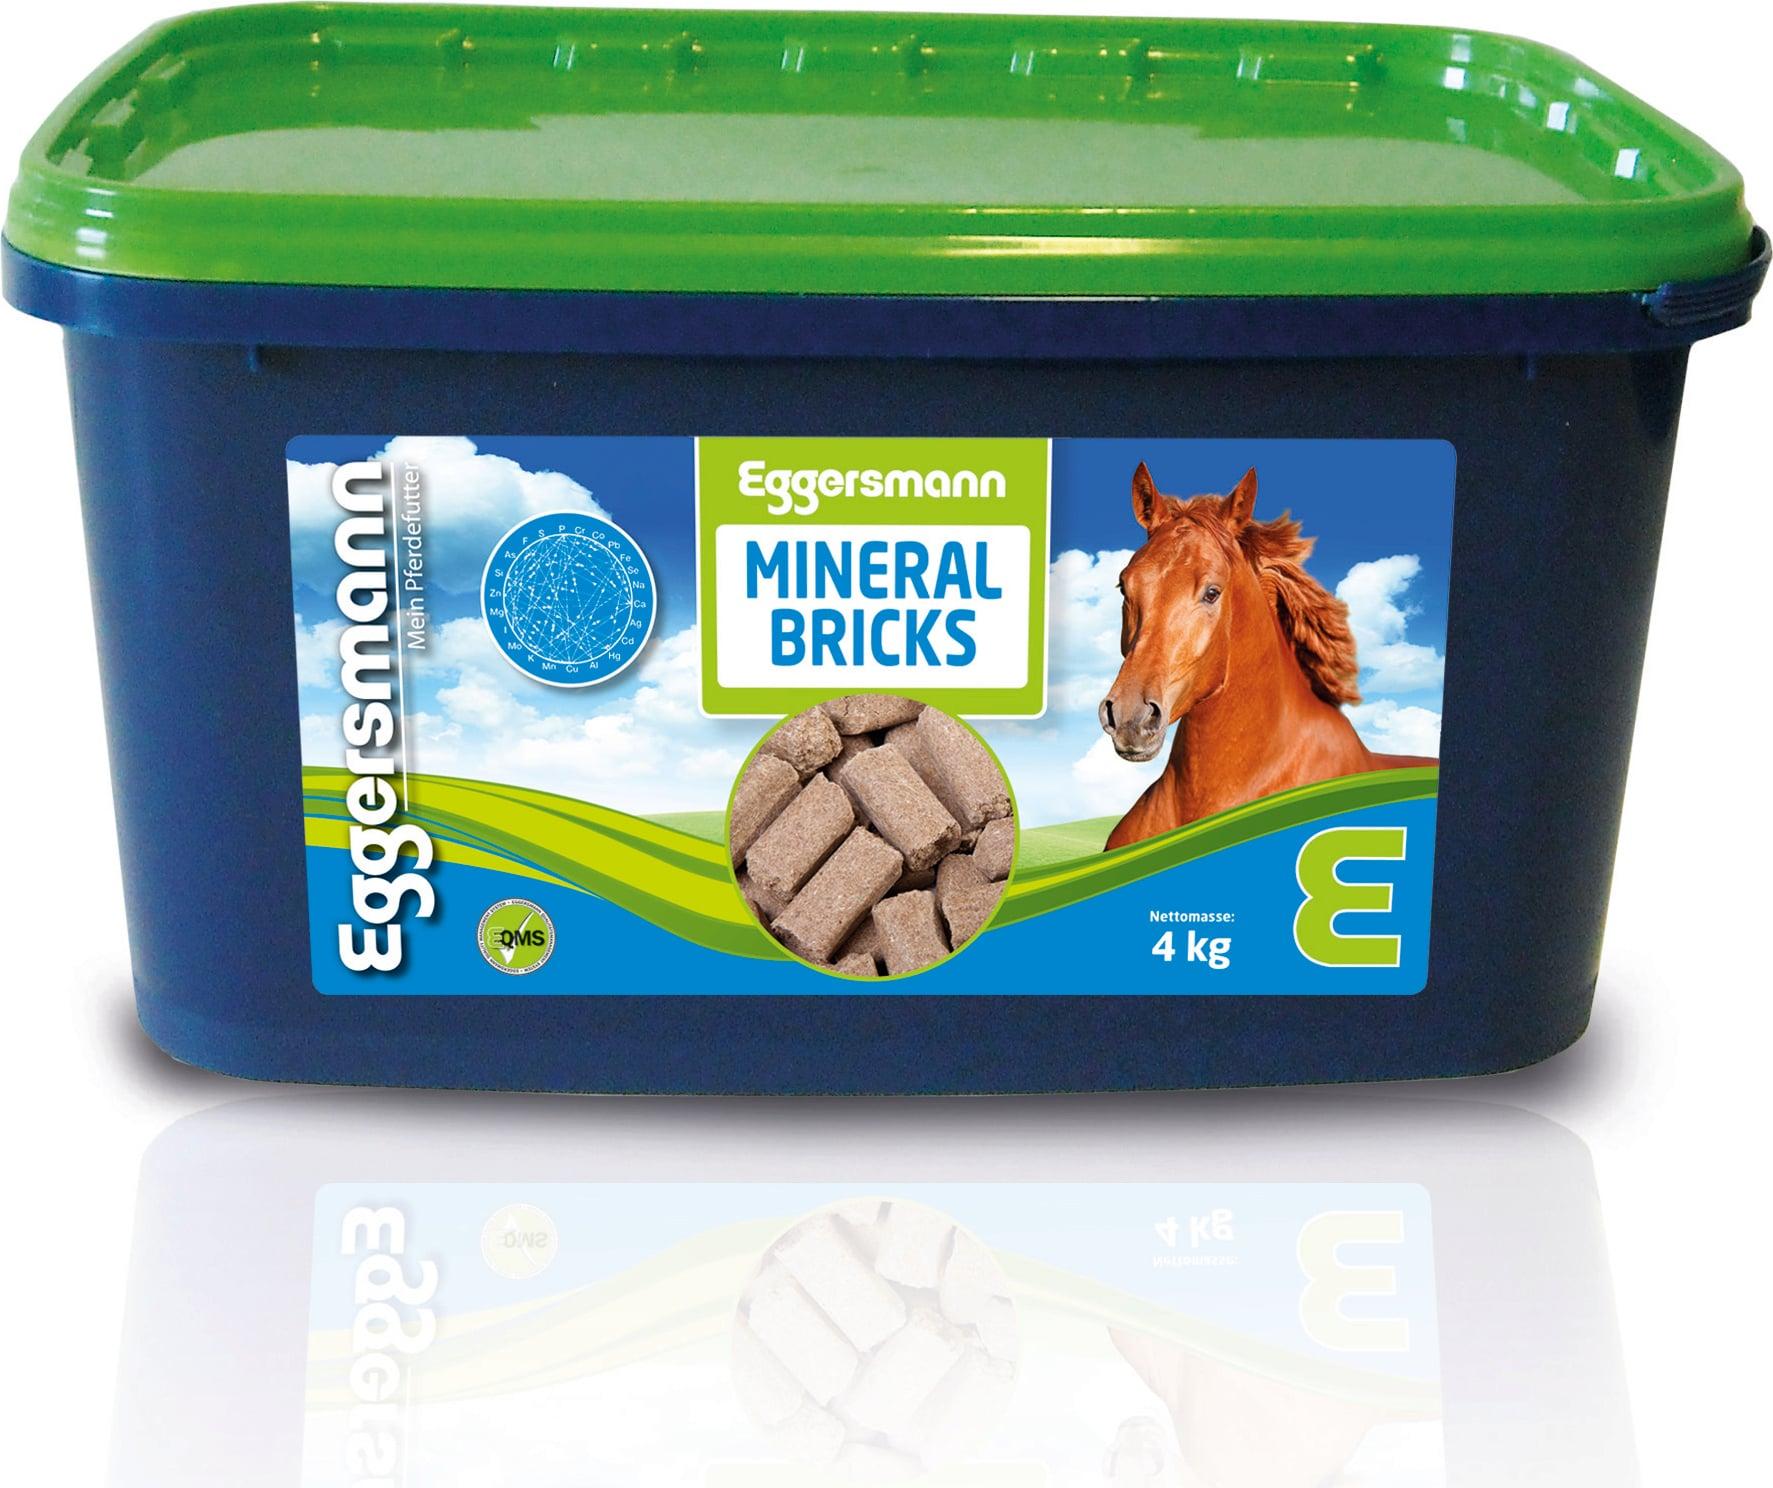 Eggersmann Mineral Bricks 4kg